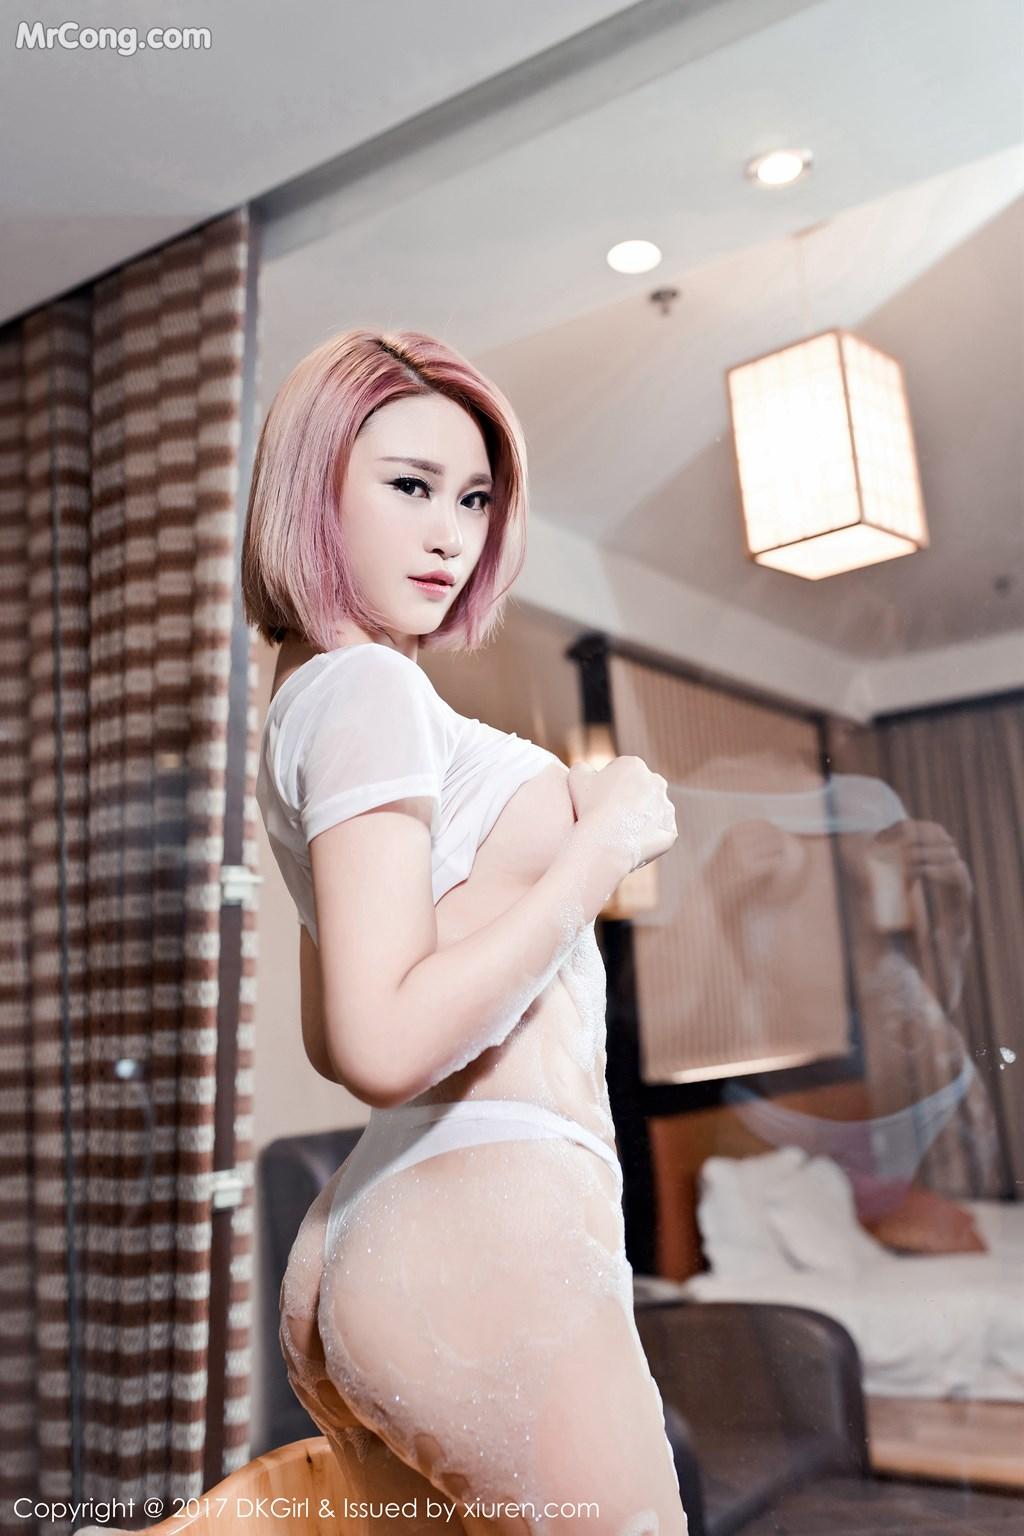 Image DKGirl-Vol.045-Meng-Bao-Er-BoA-MrCong.com-049 in post DKGirl Vol.045: Người mẫu Meng Bao Er (萌宝儿BoA) (56 ảnh)